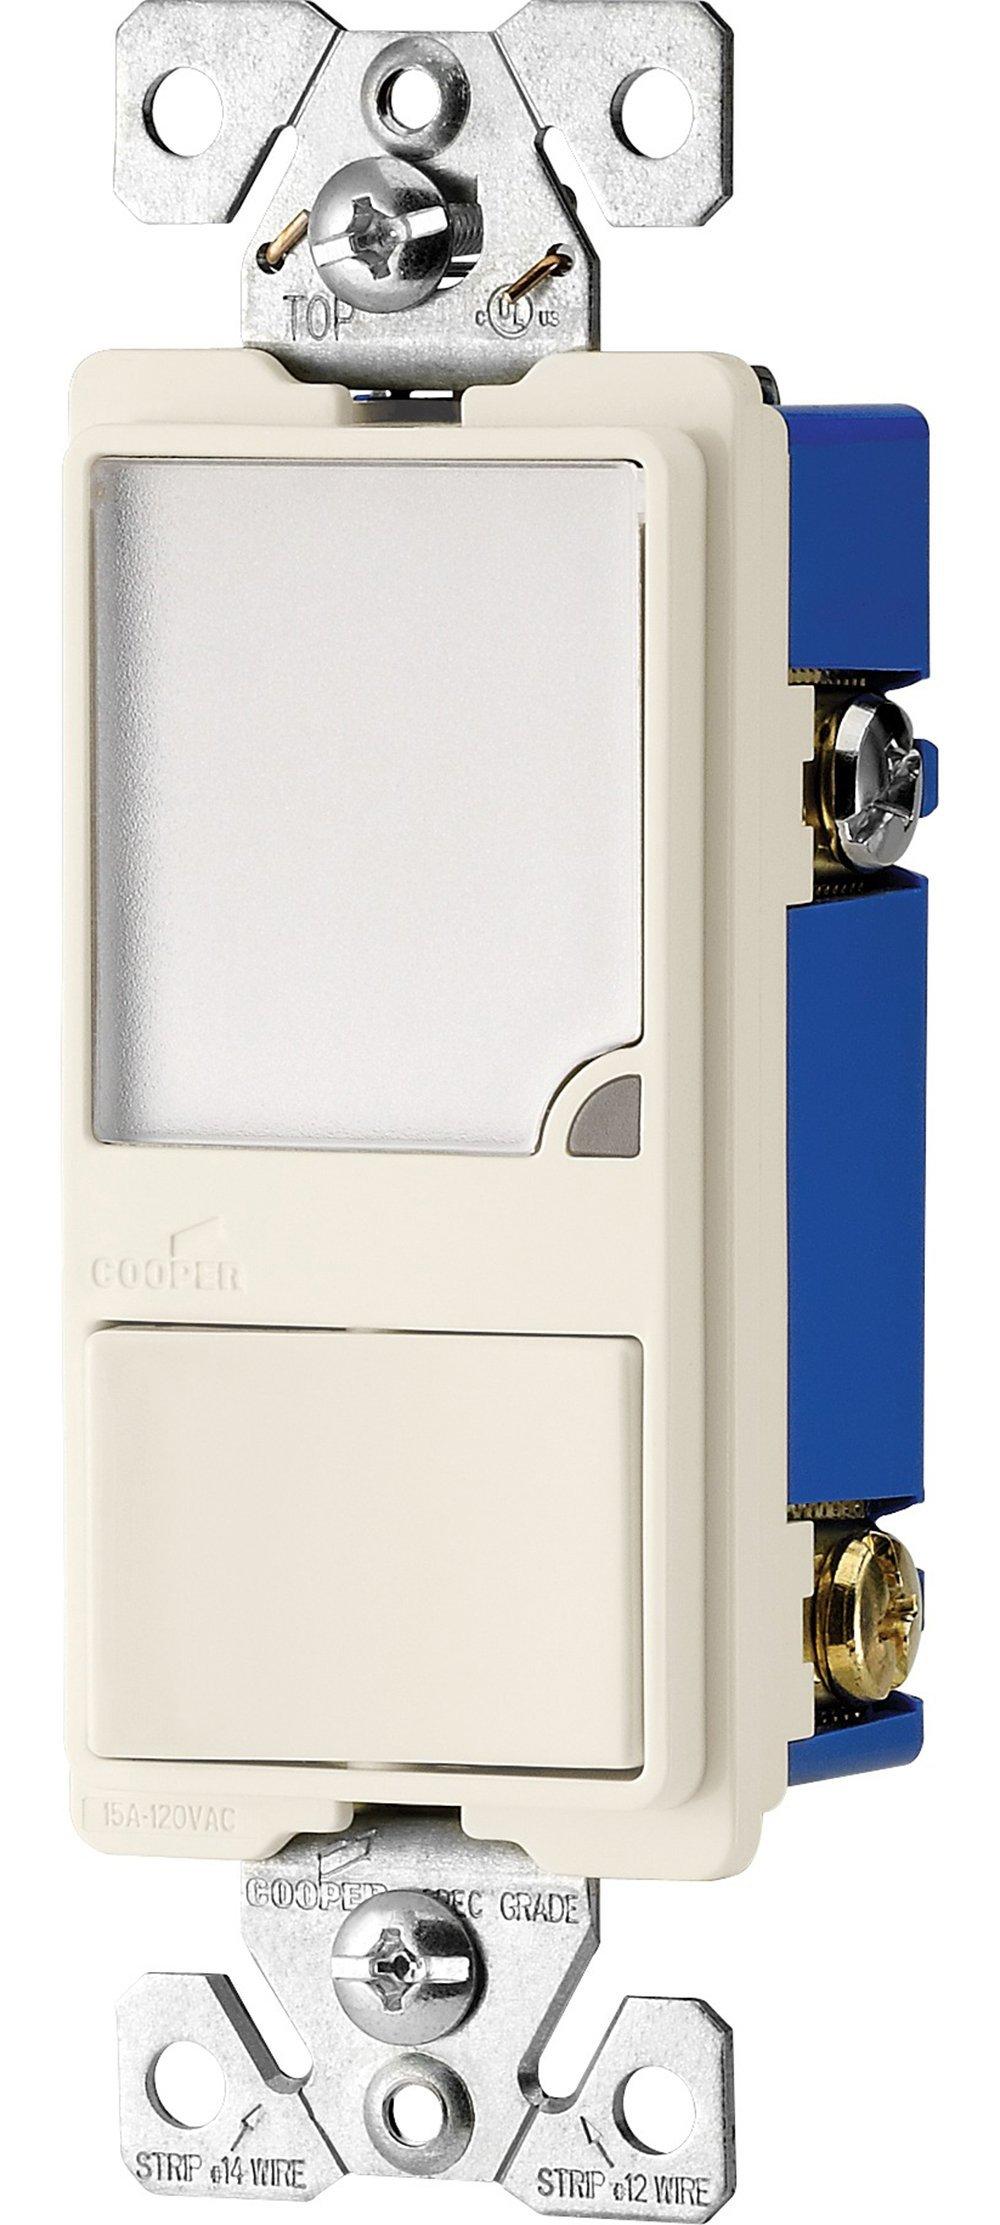 Eaton 7738LA-BOX 15 Amp Single Pole Combination Switch and Dimmable LED Nightlight, Light Almond